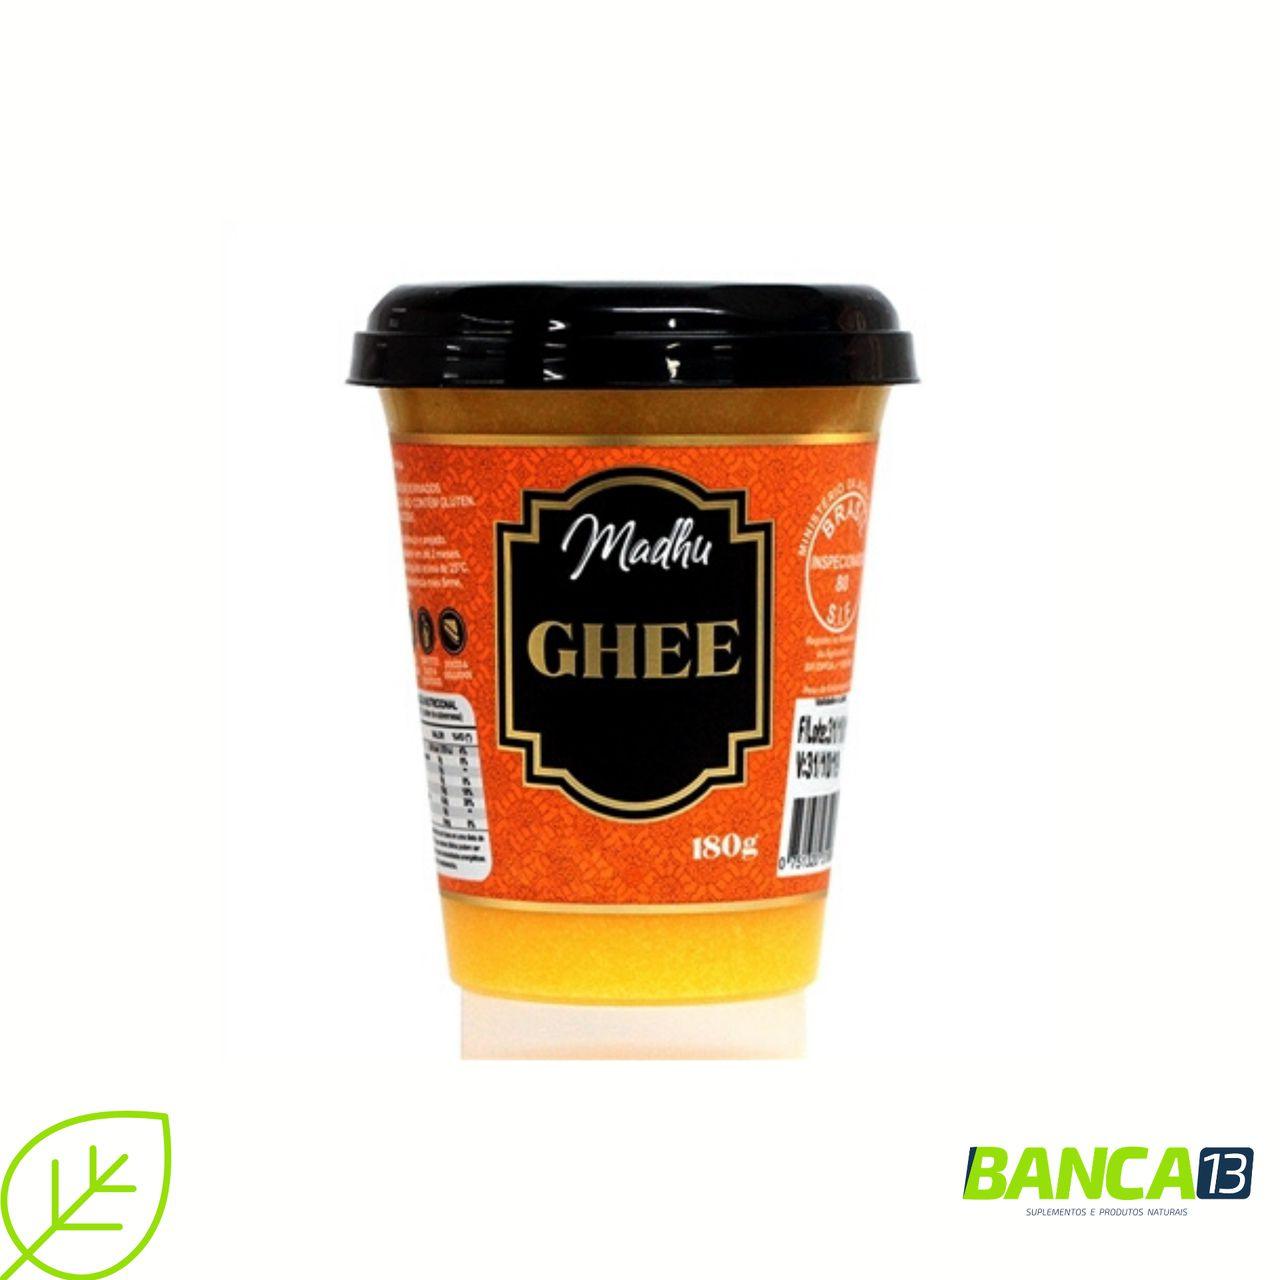 Manteiga Ghee 180g Tradicional Clarificada Madhu Bakery